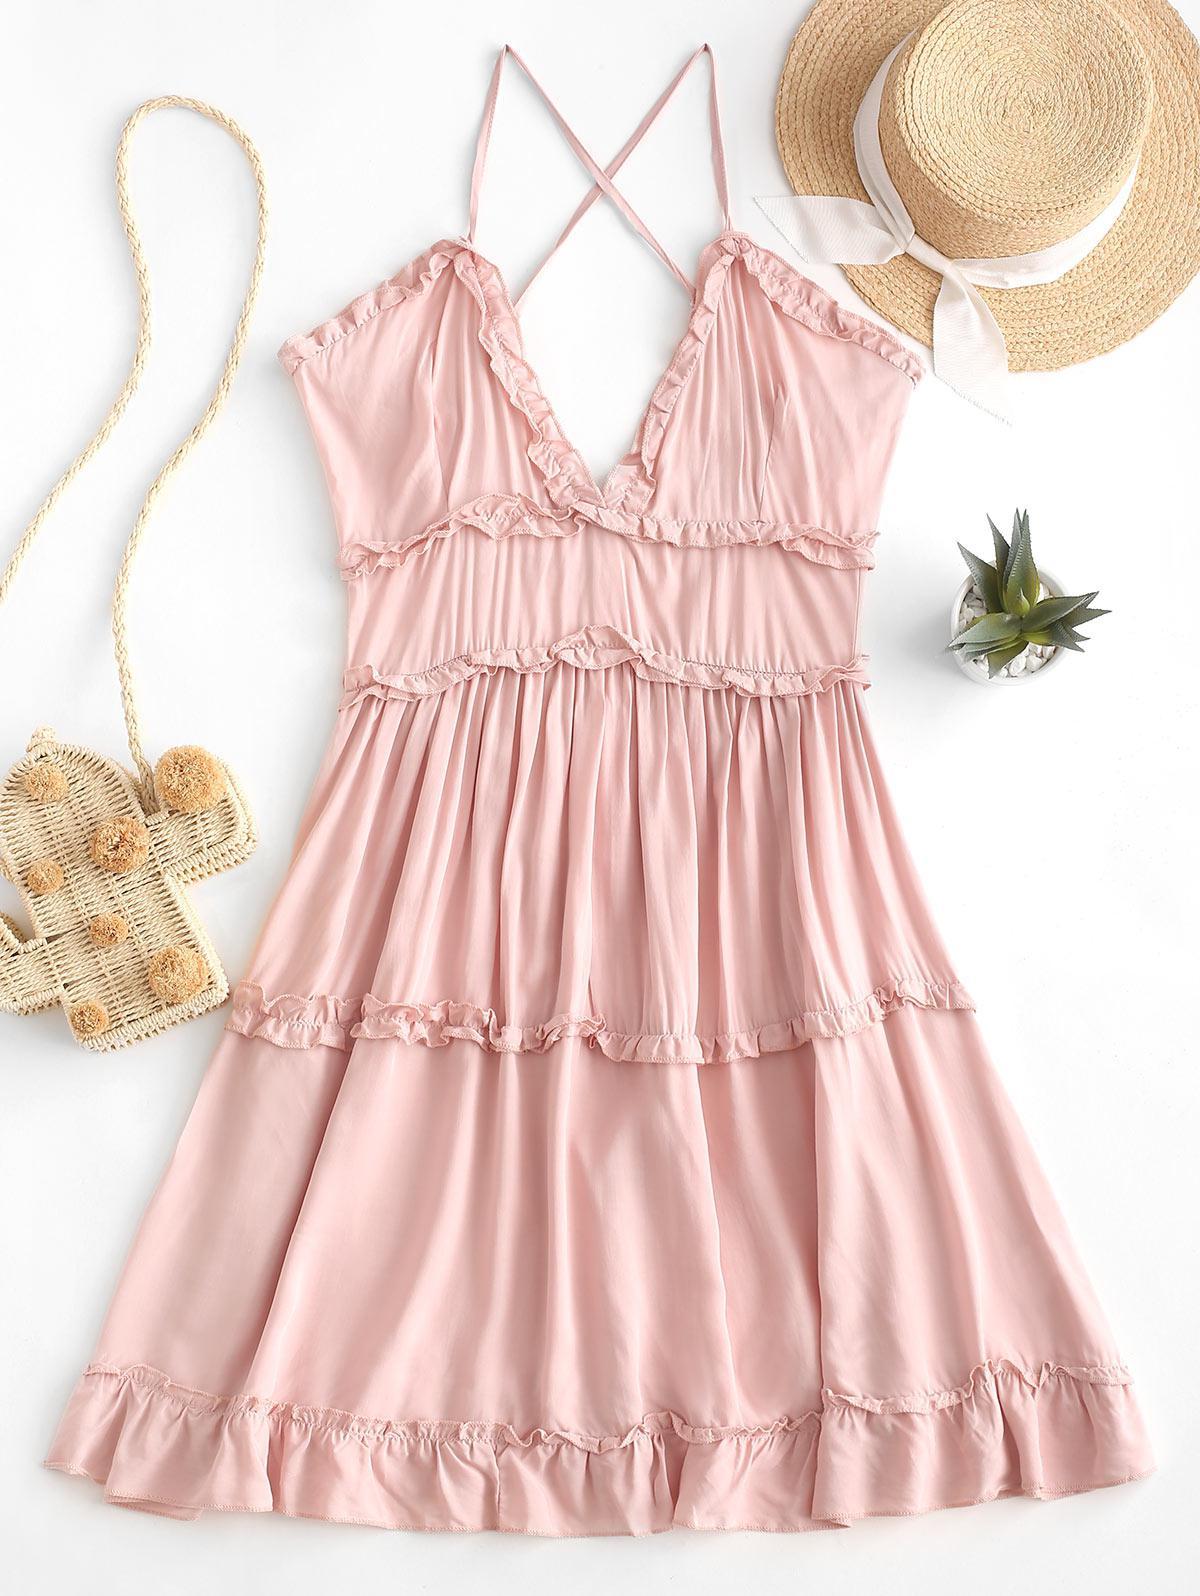 Criss Cross Mini Dress Ruffle